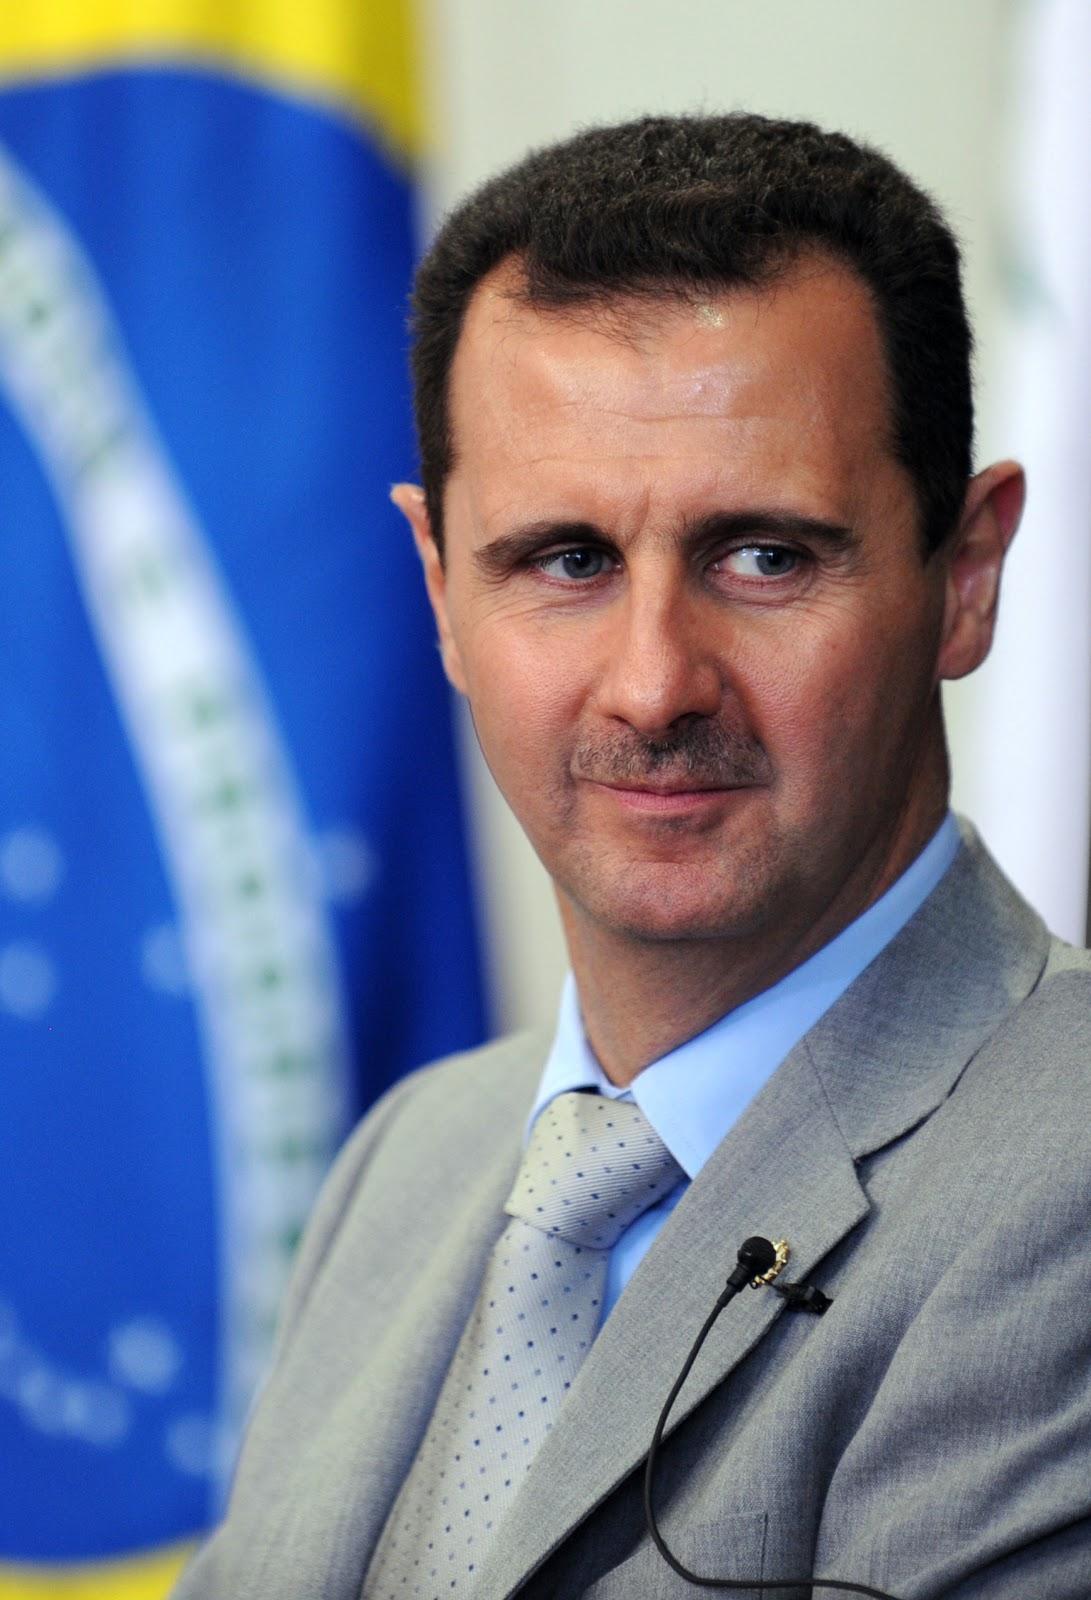 http://2.bp.blogspot.com/-gvZw0JHSVps/UAccfRgwVII/AAAAAAAAIv4/jYkO4lPtRNQ/s1600/1080-Bashar_al-Assad+File+Photo+-+FABIO+RODRIGUES-POZZEBOM-ABR.jpg